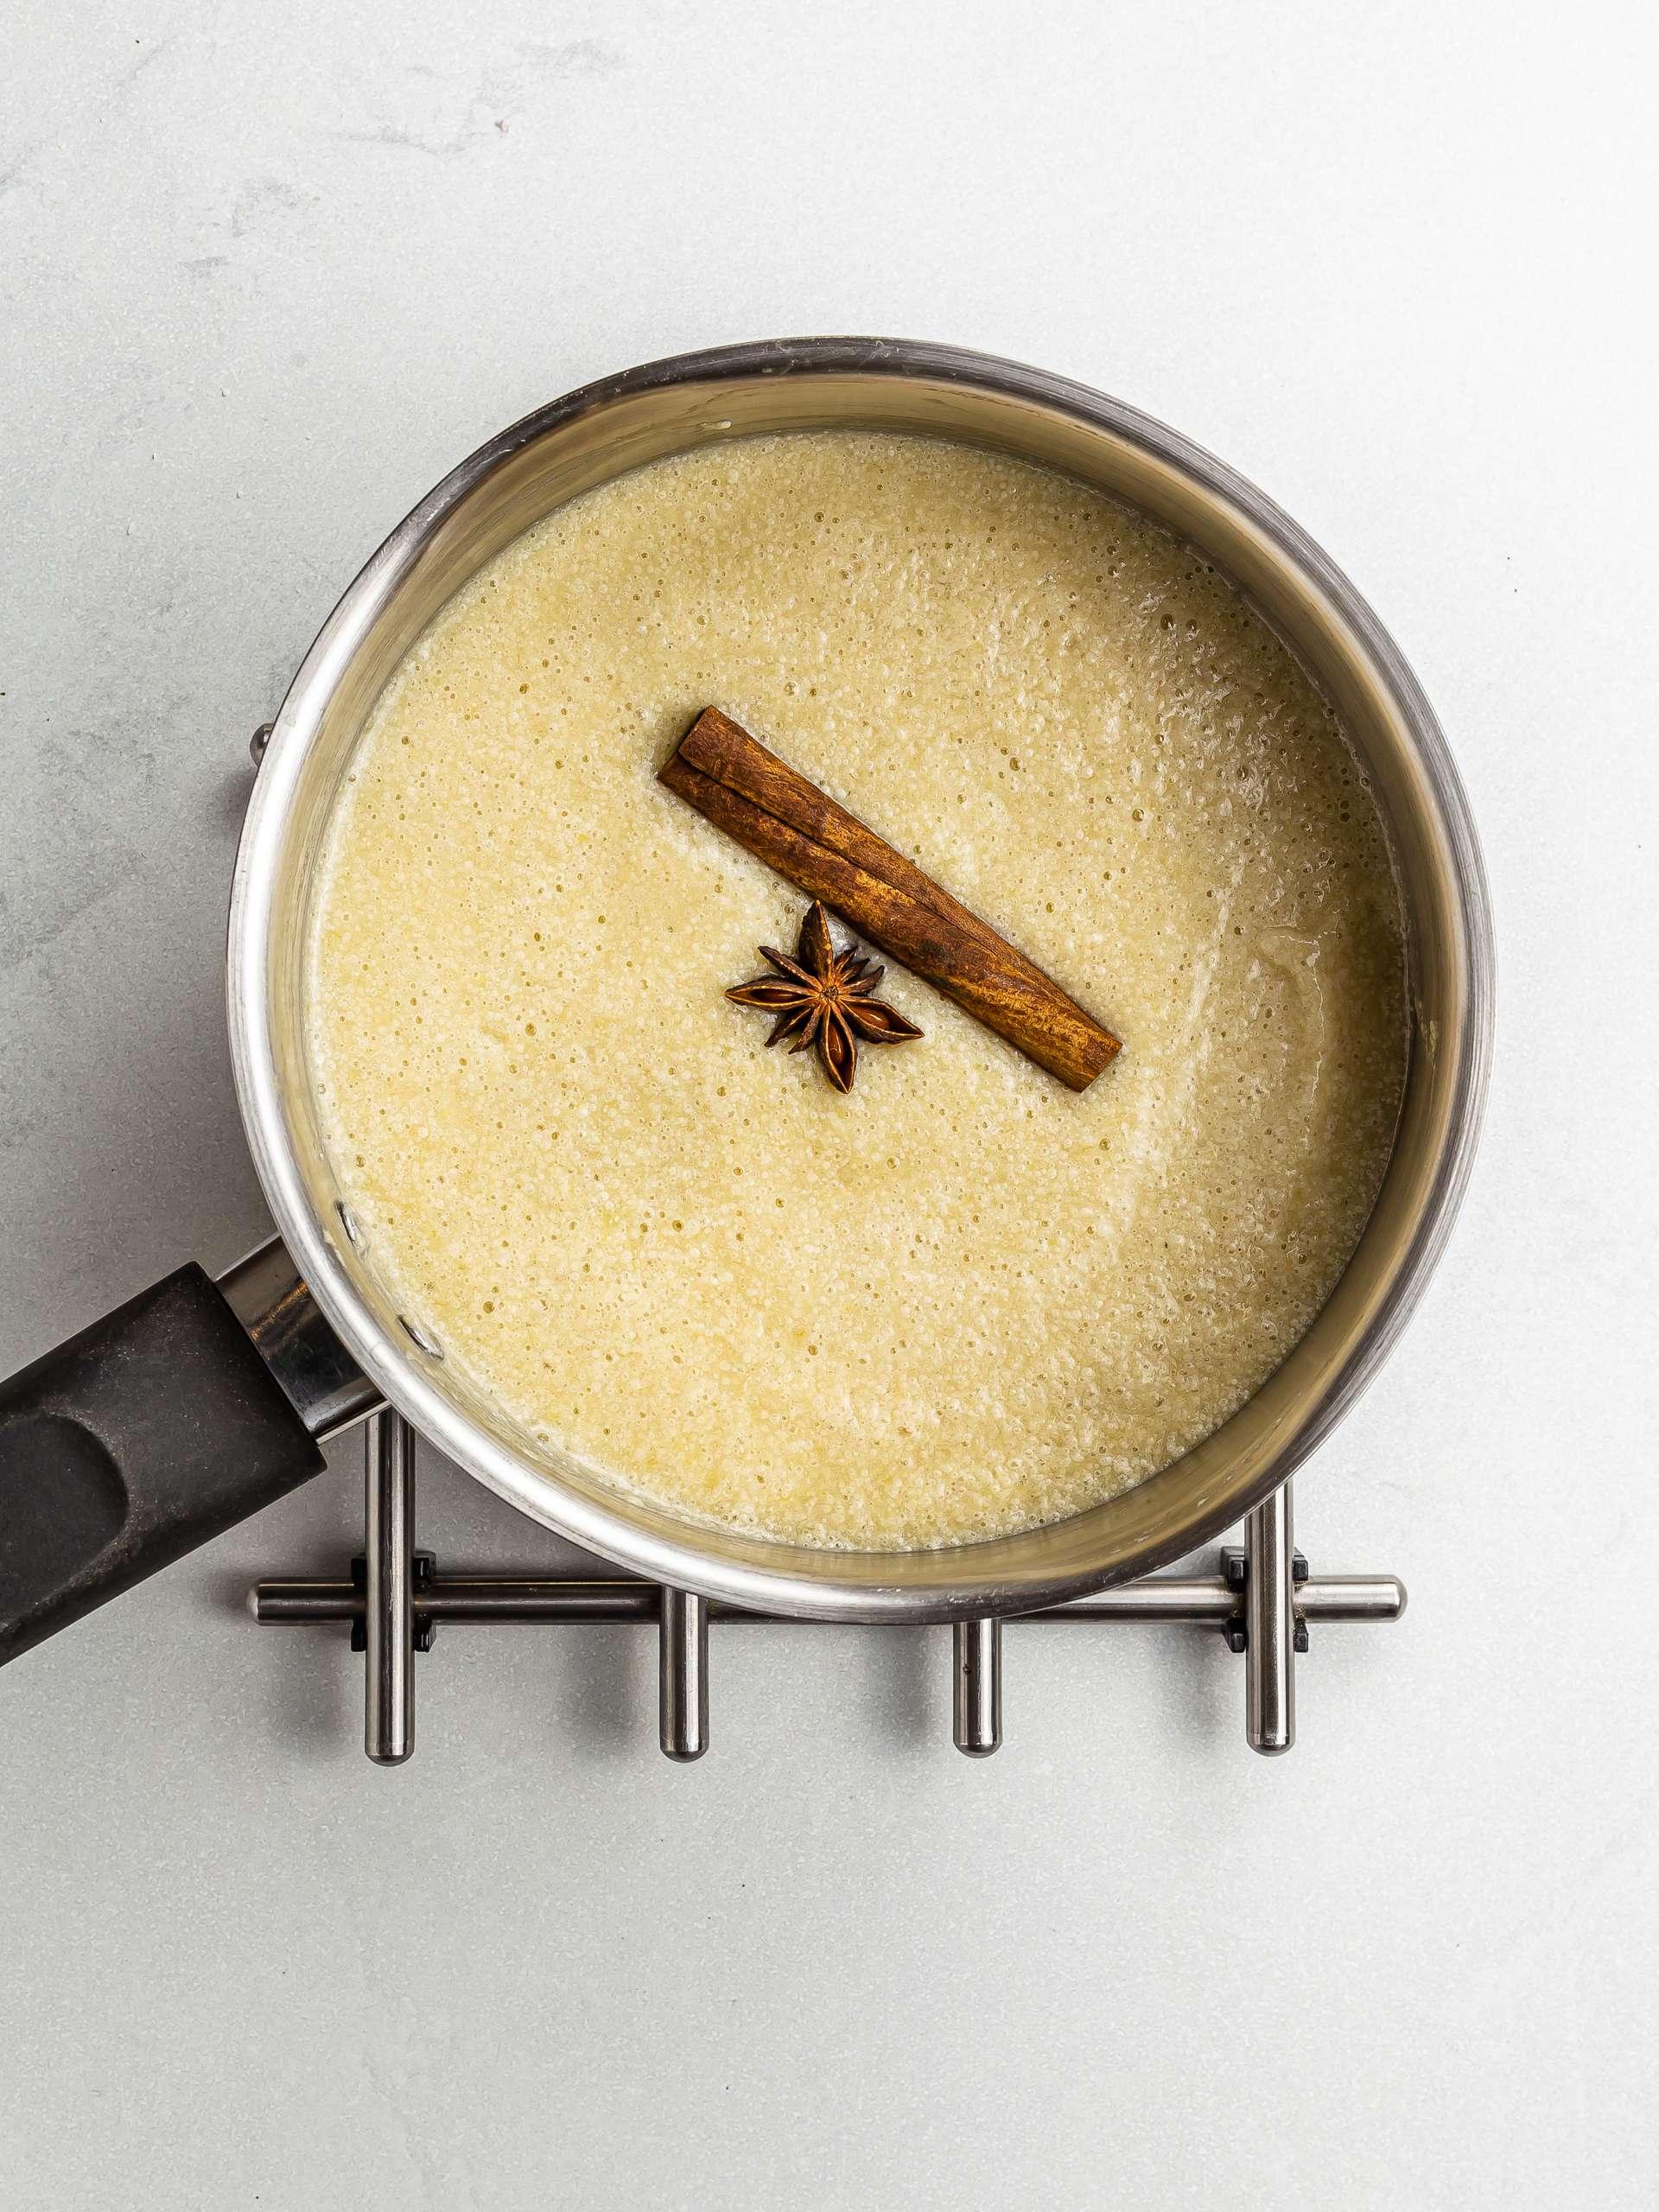 cooking plantain porridge in a pot